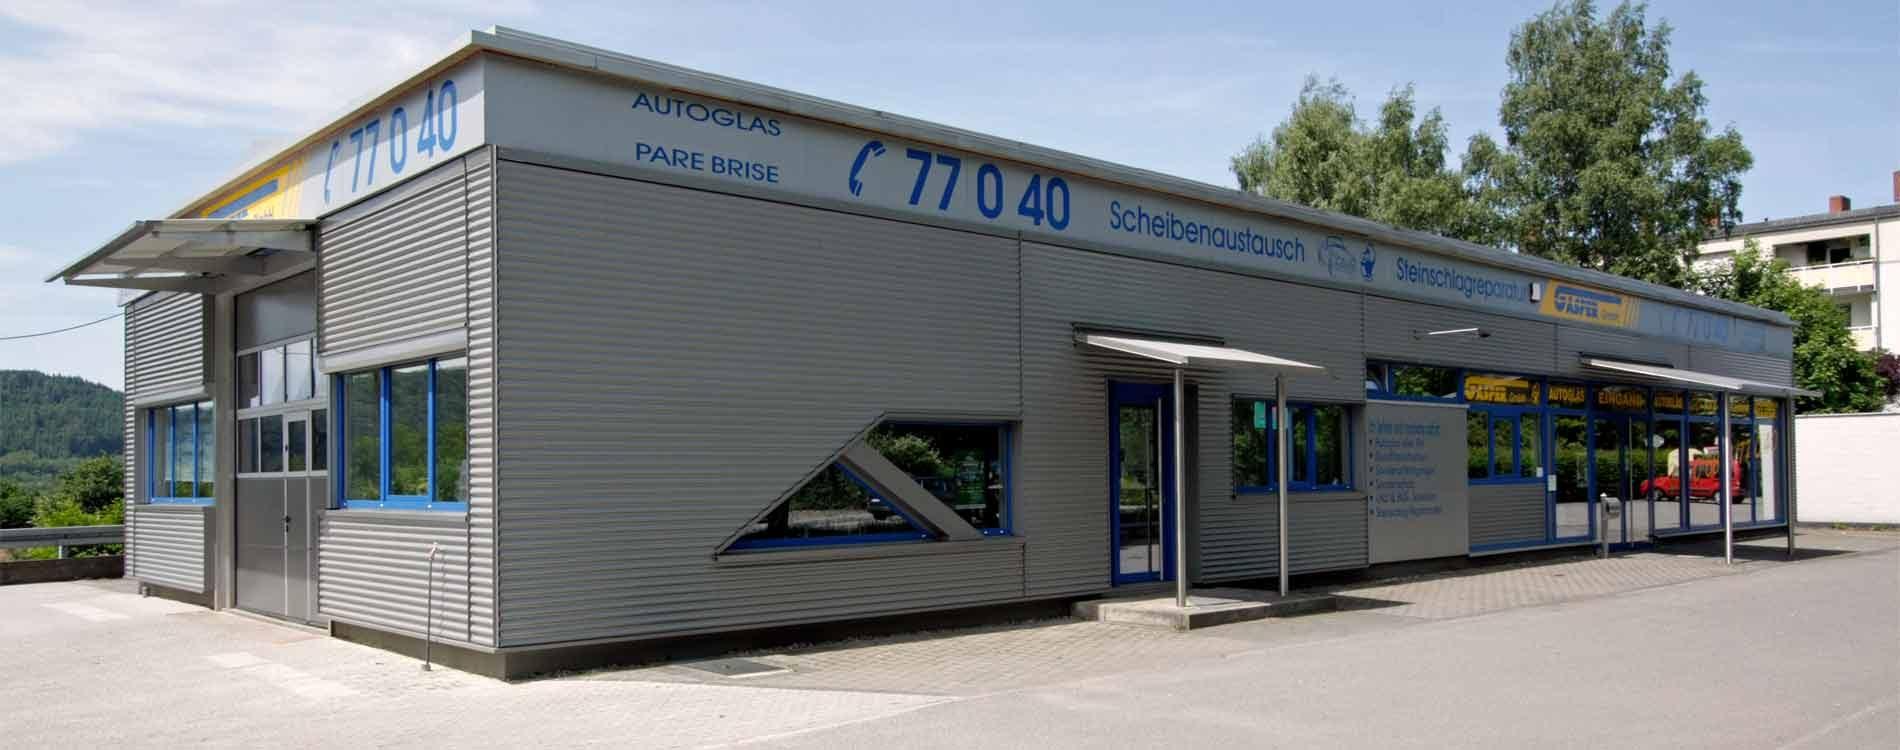 Auto Gasper Halle Bild2